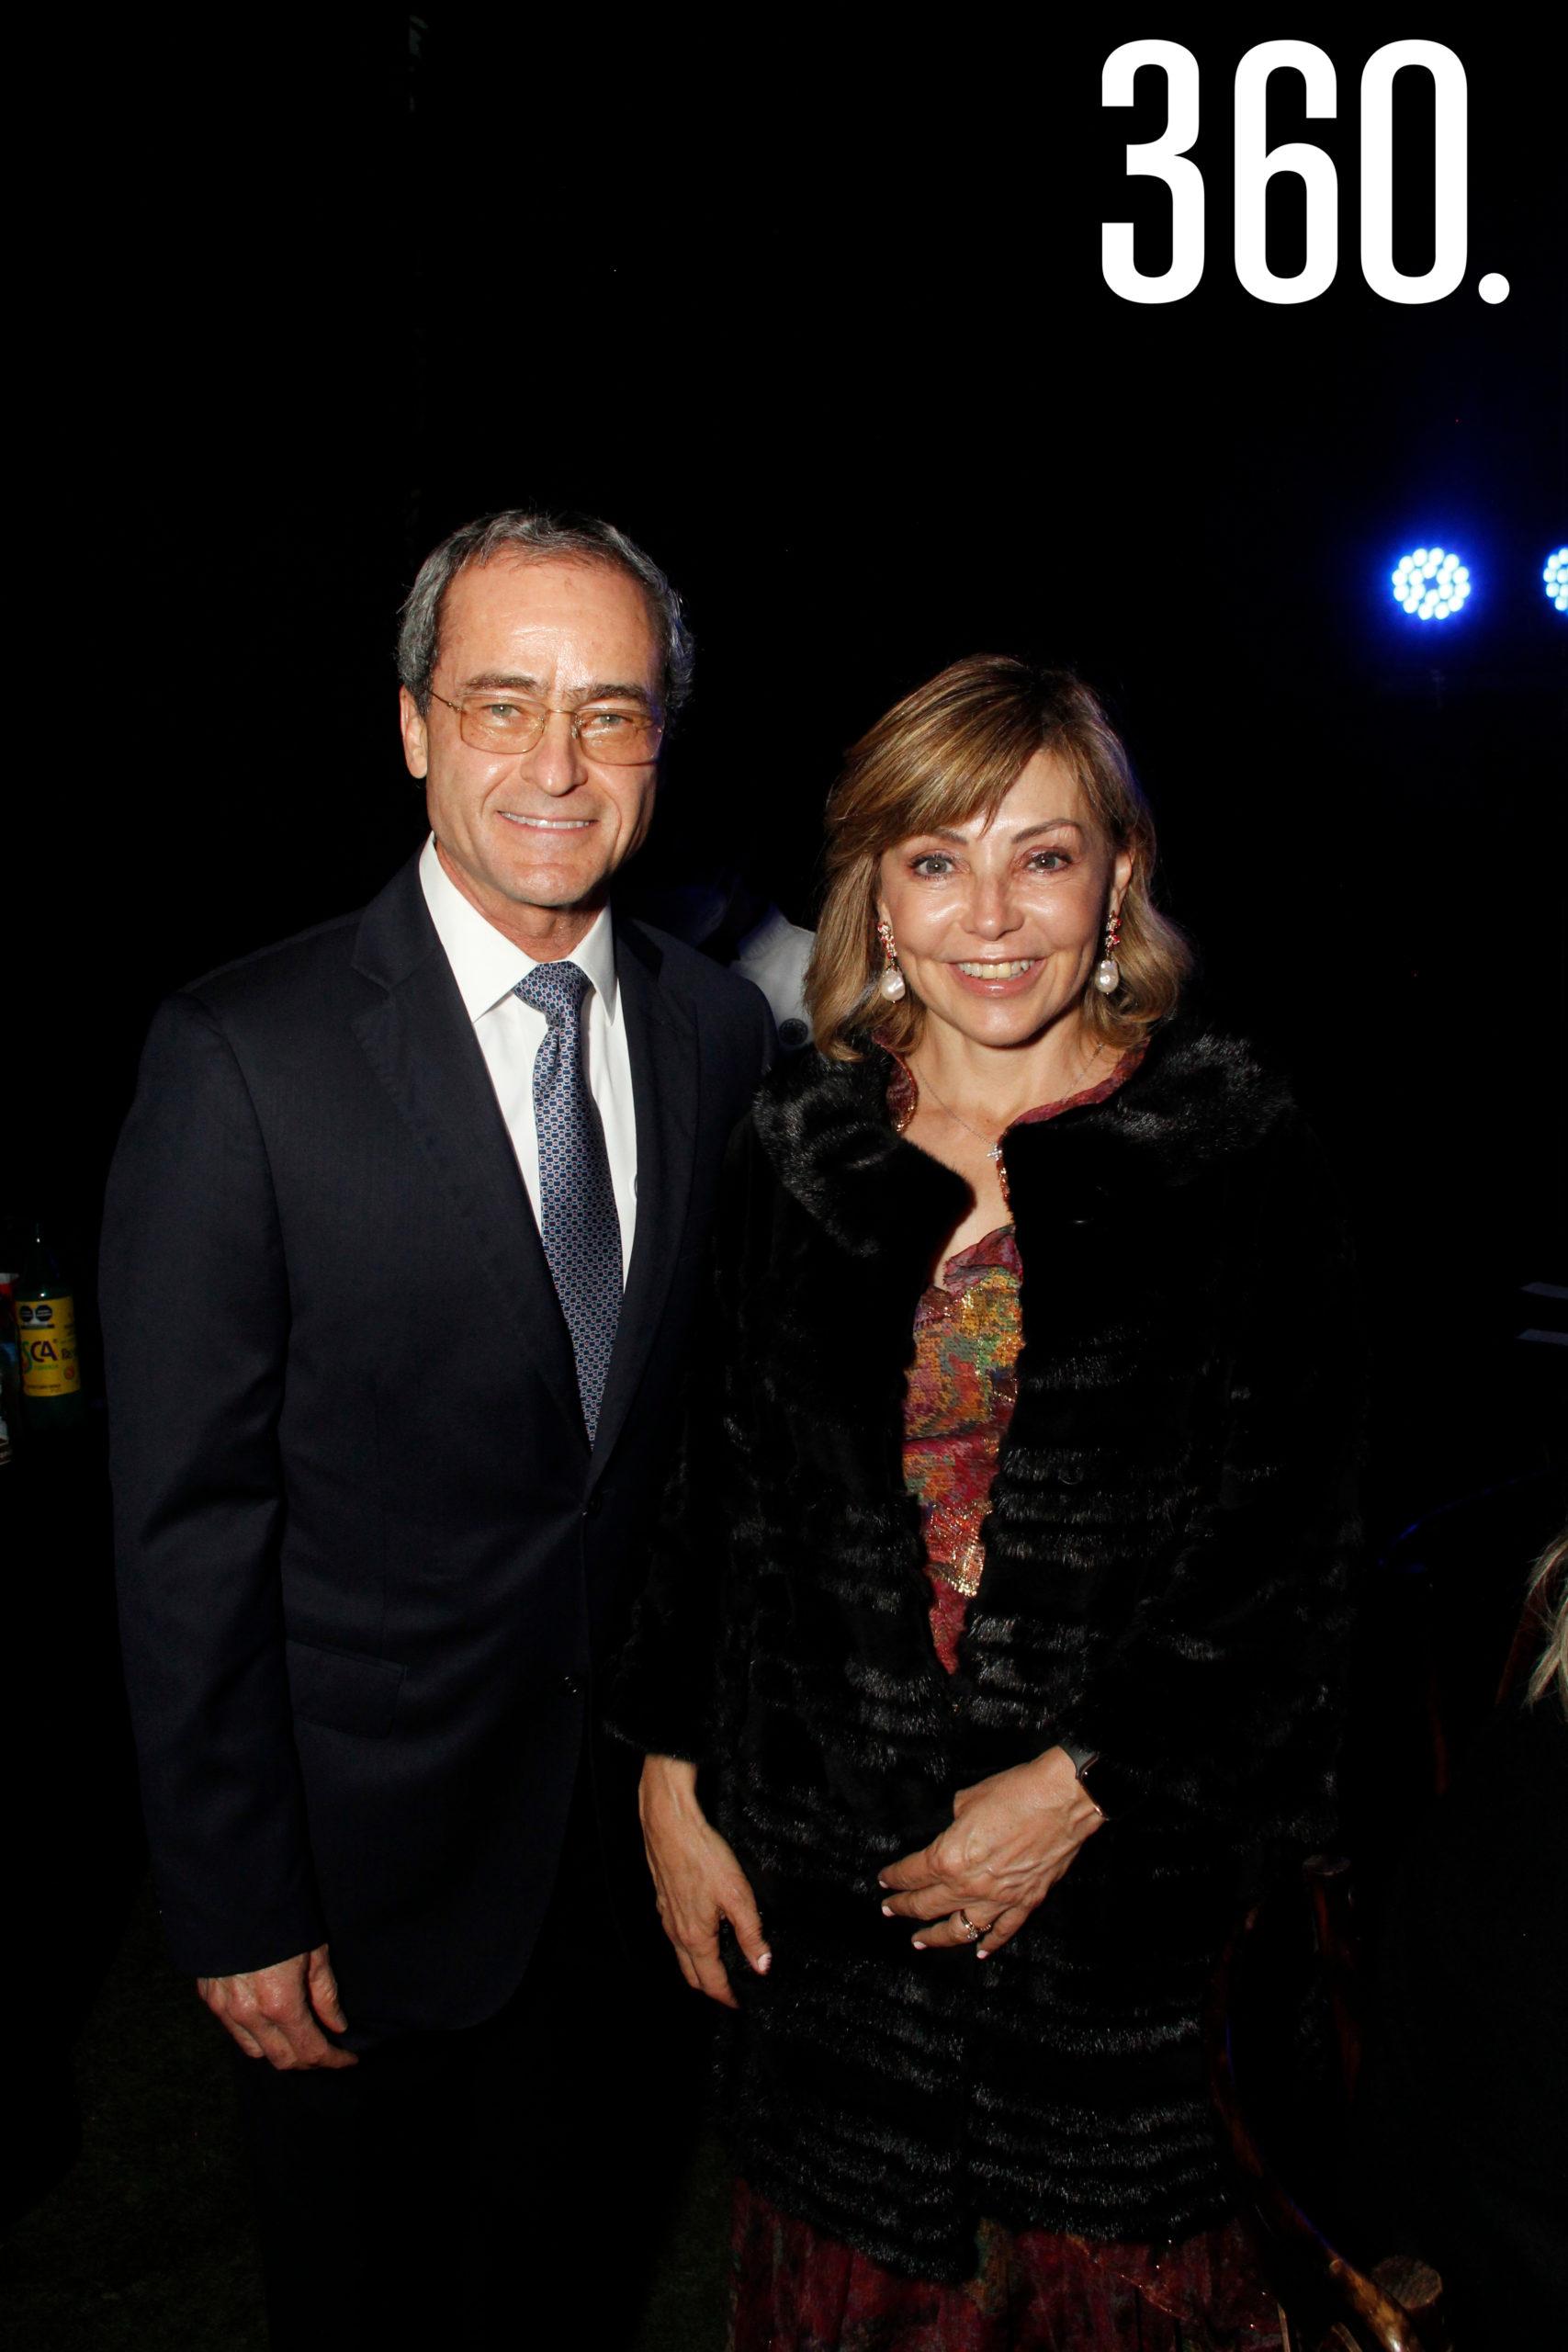 Luis Arizpe y Conchita Aguirre.